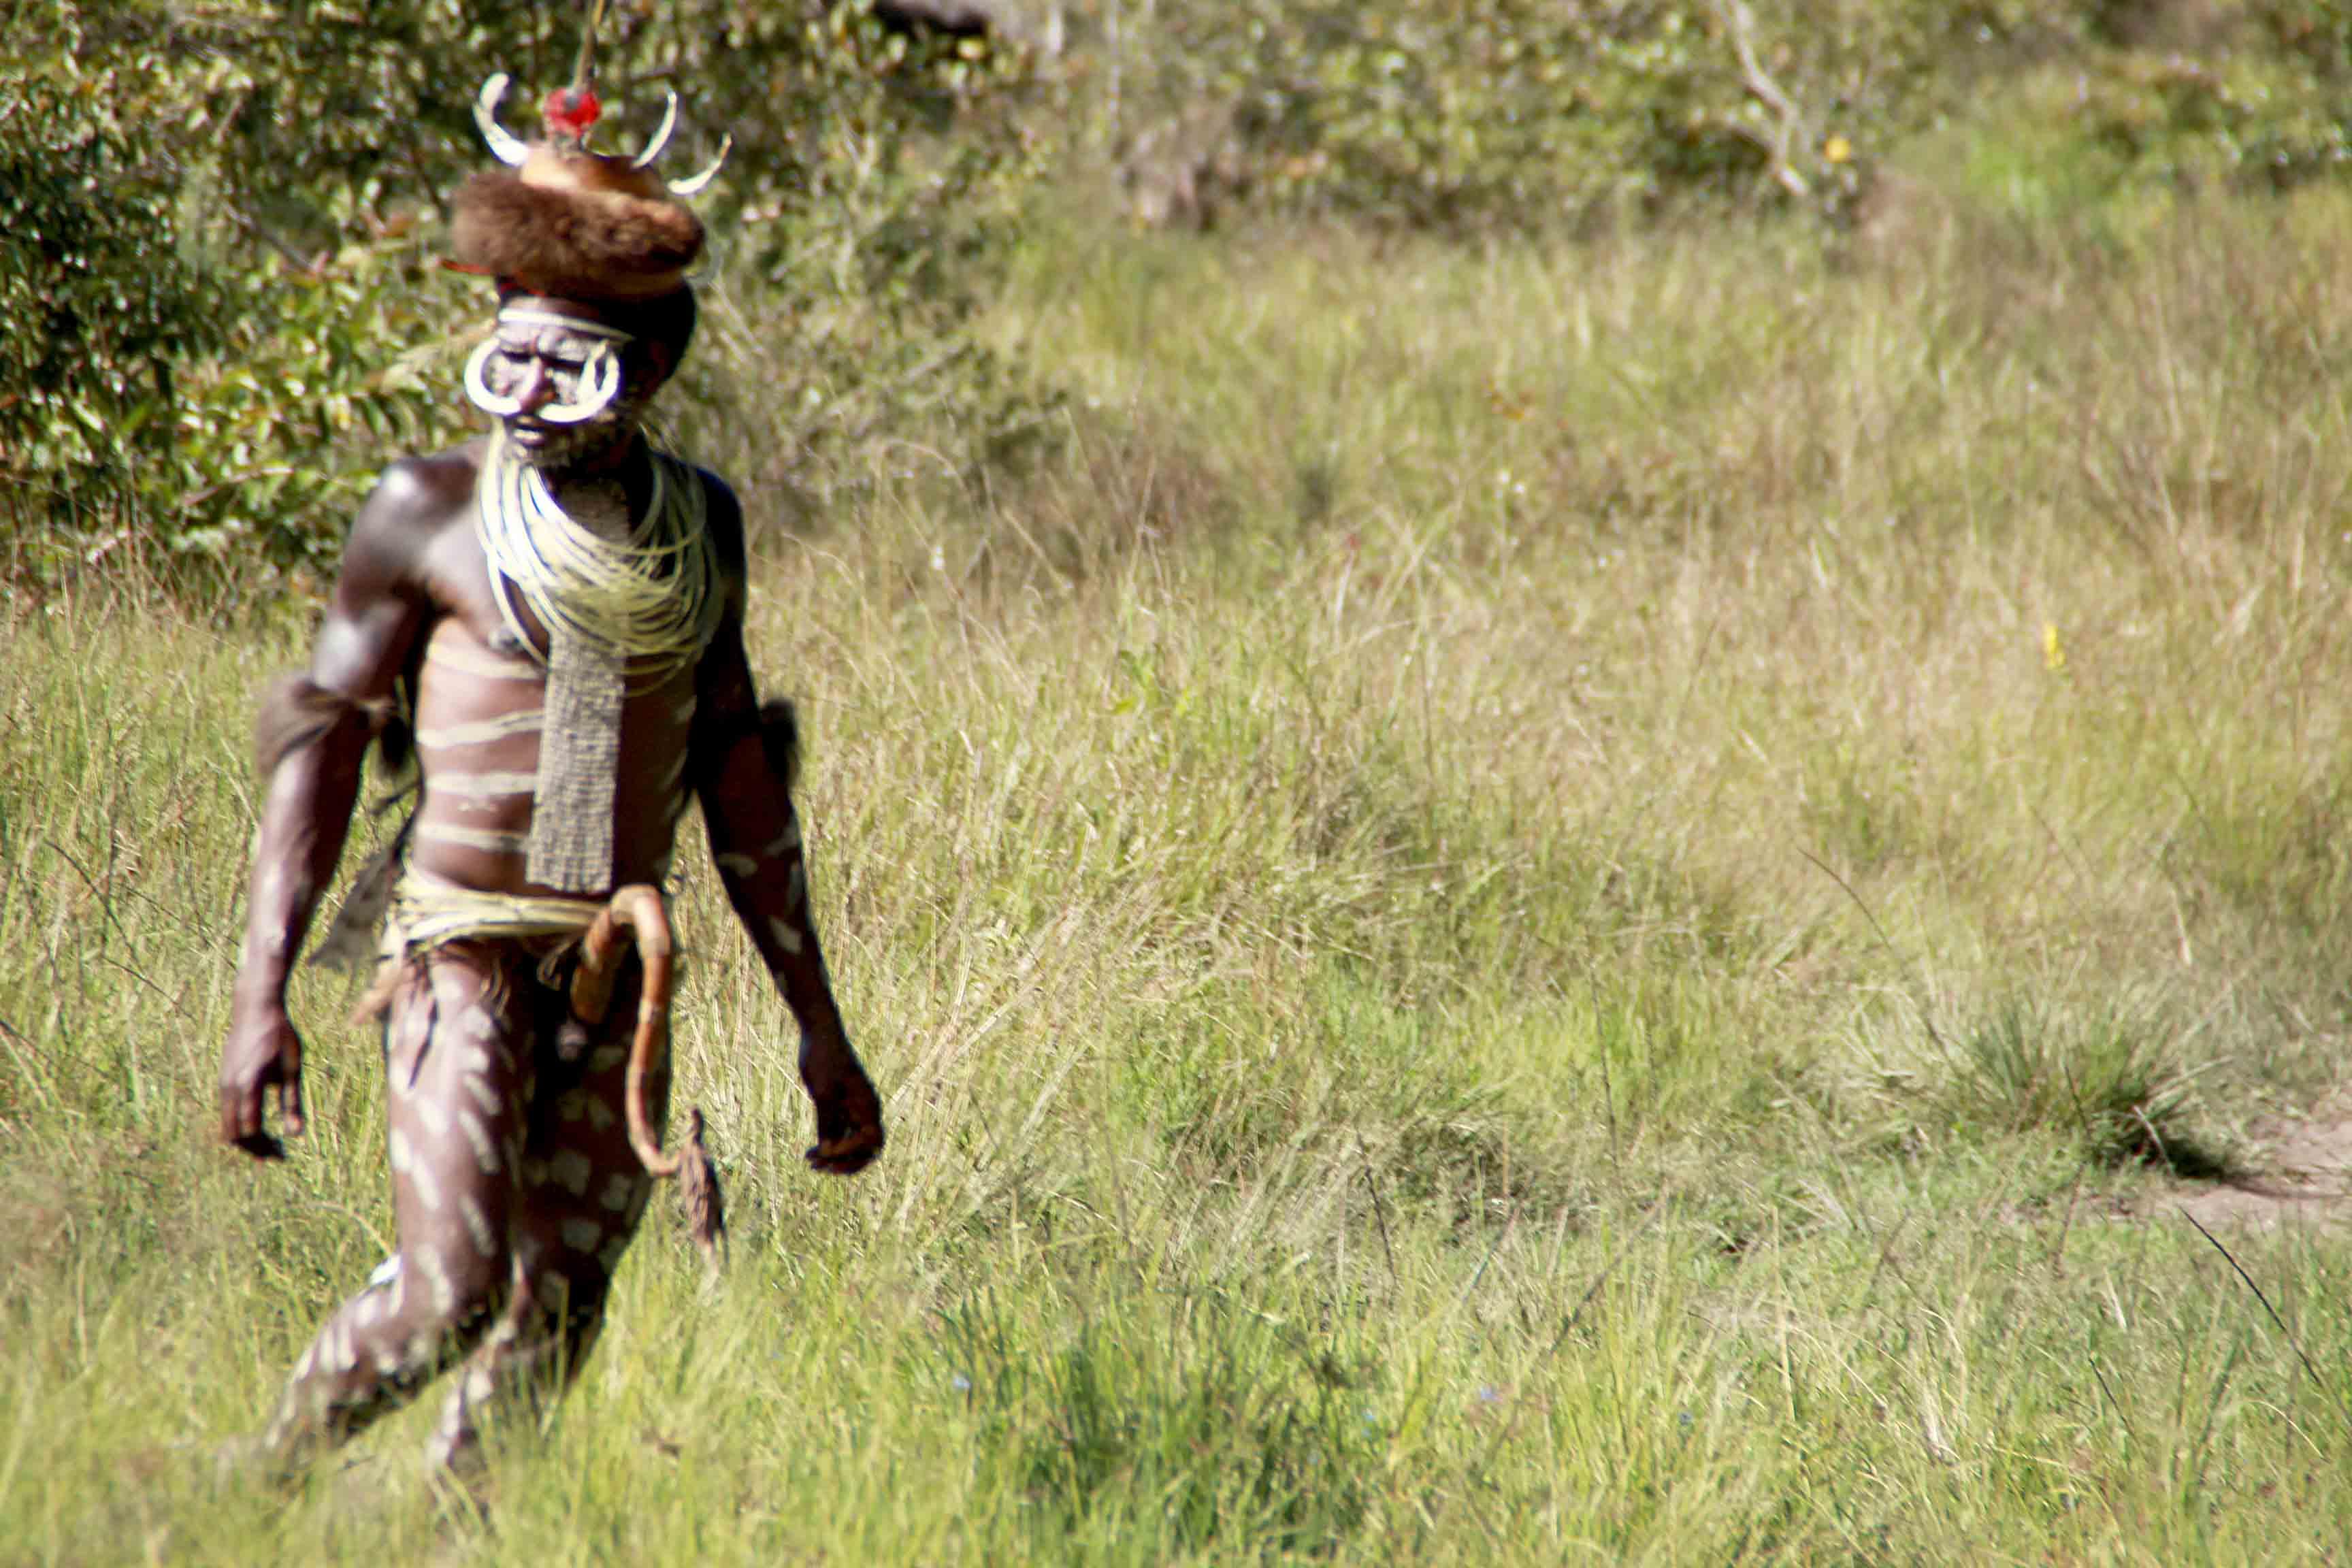 Gagahnya Panglima Perang Suku Dani, Papua - 6